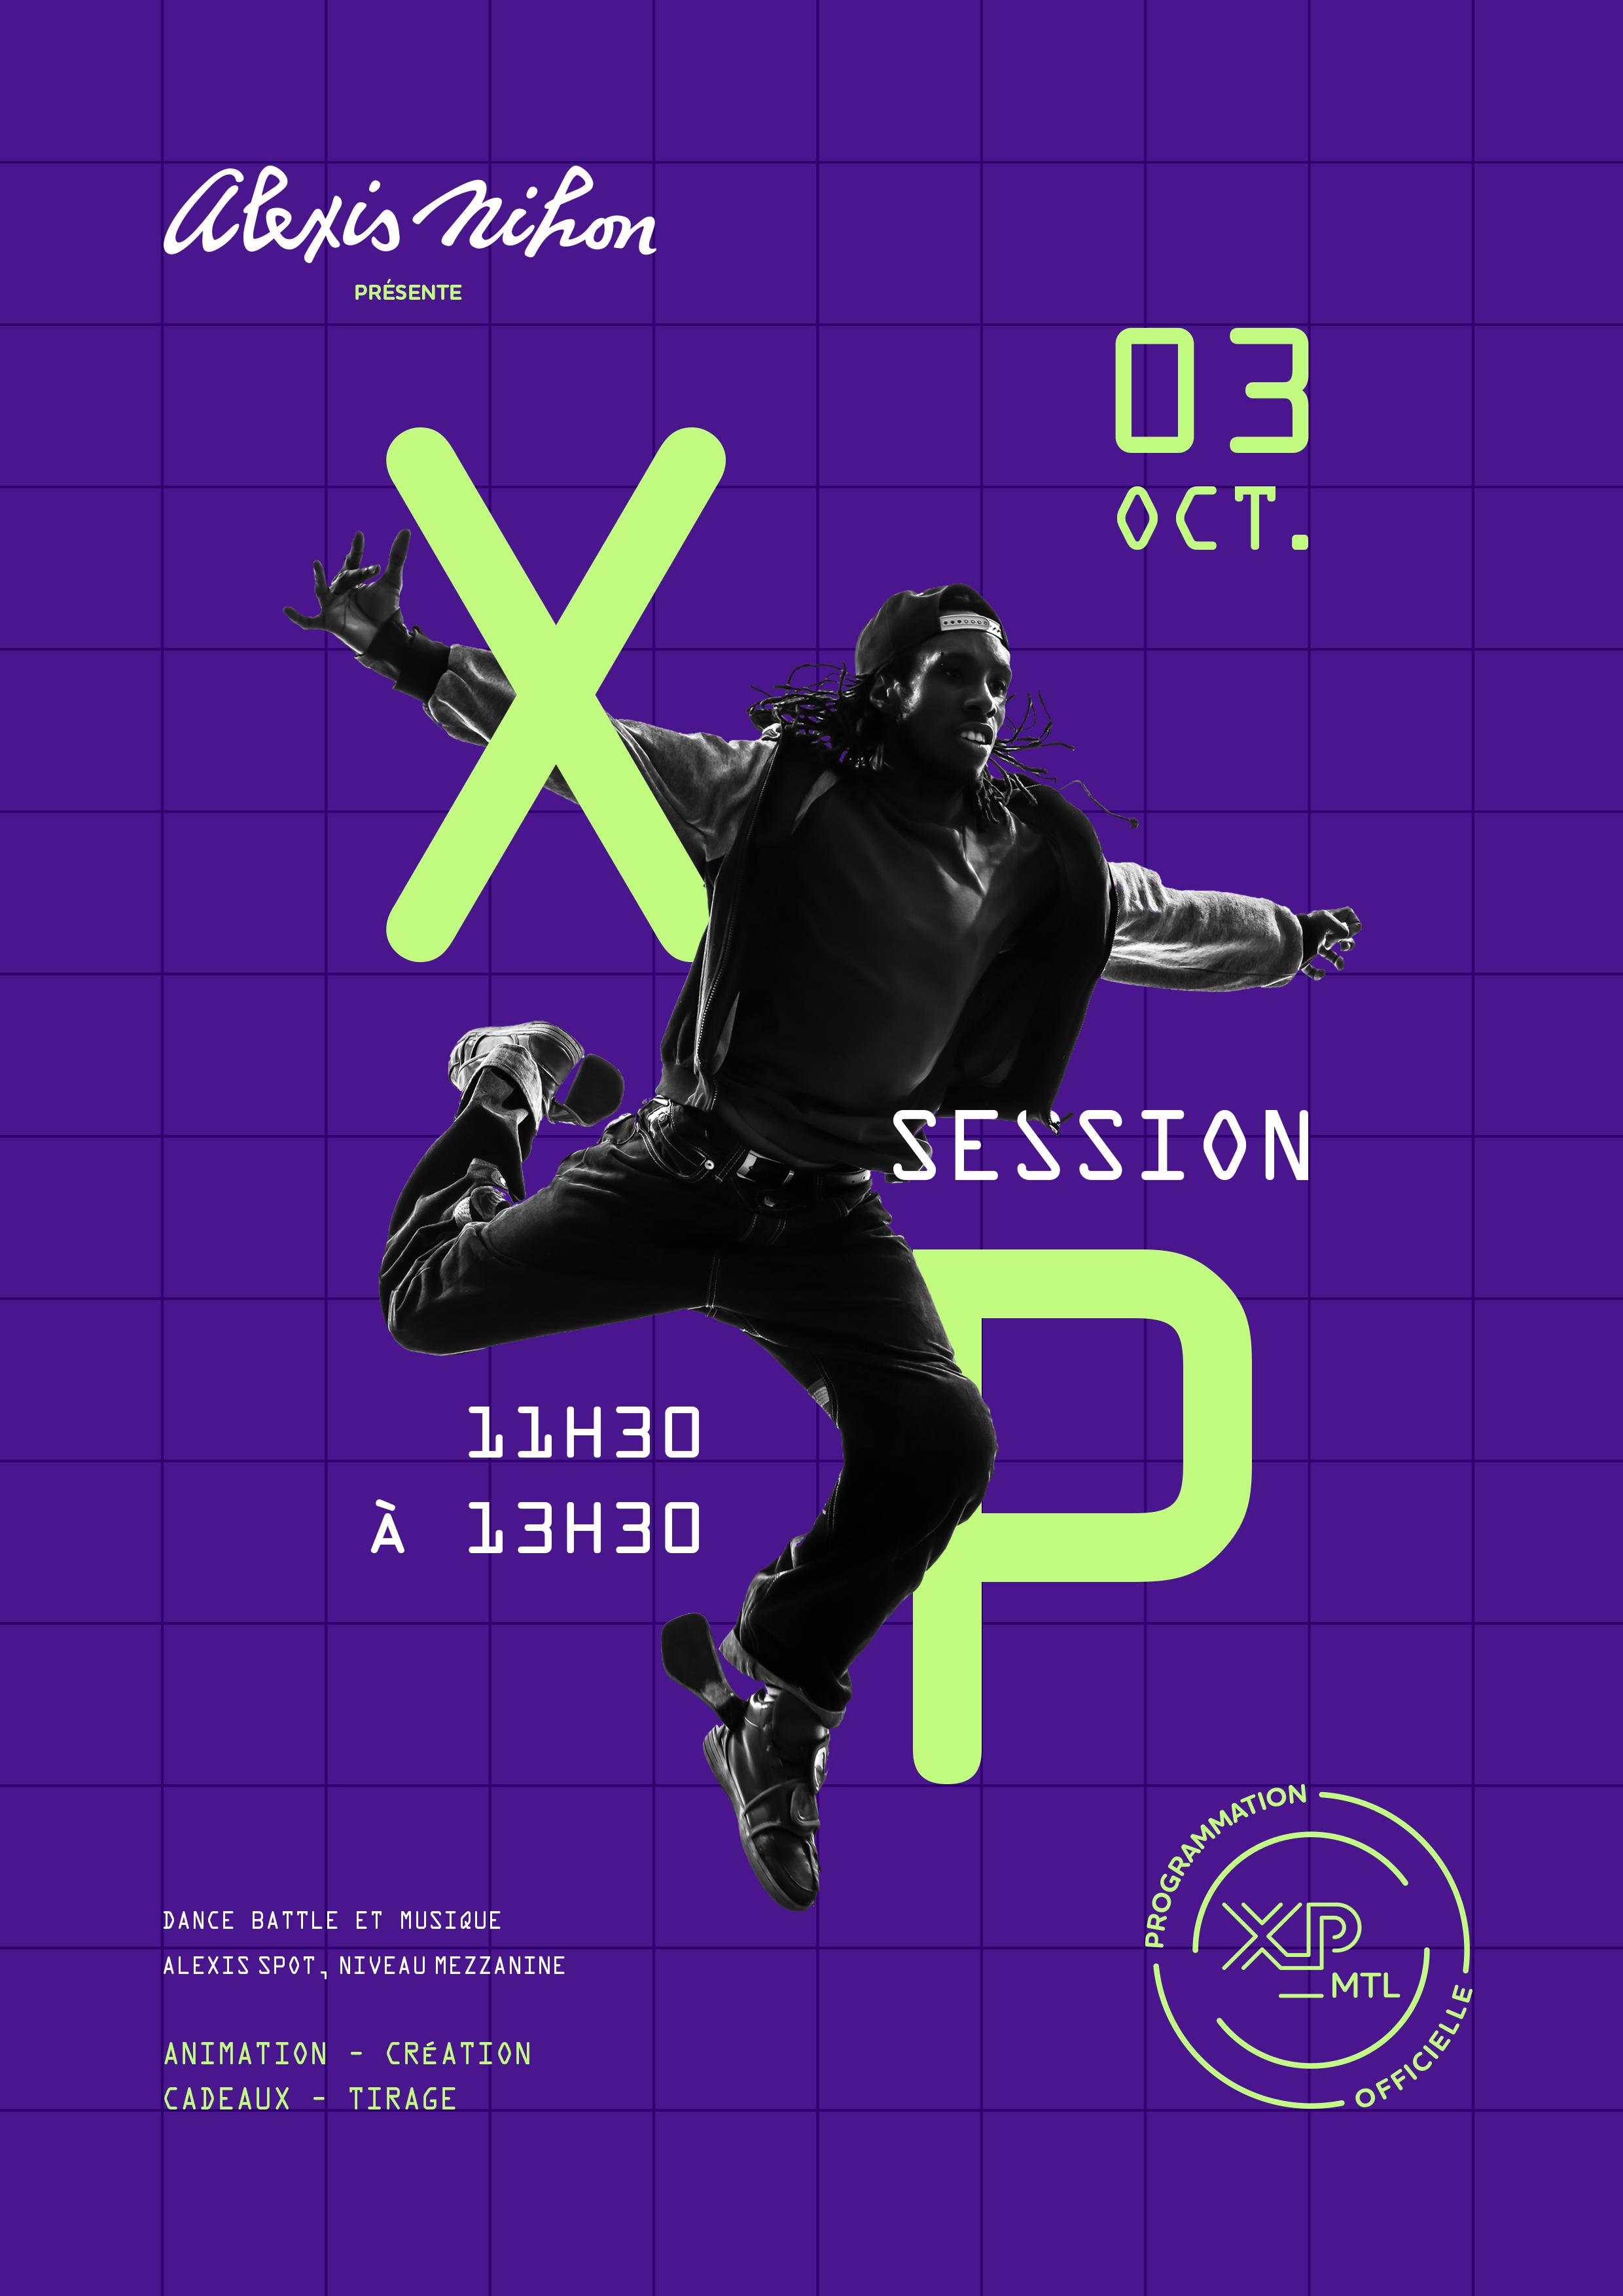 XP_SESSION DANCE SHOWCASE